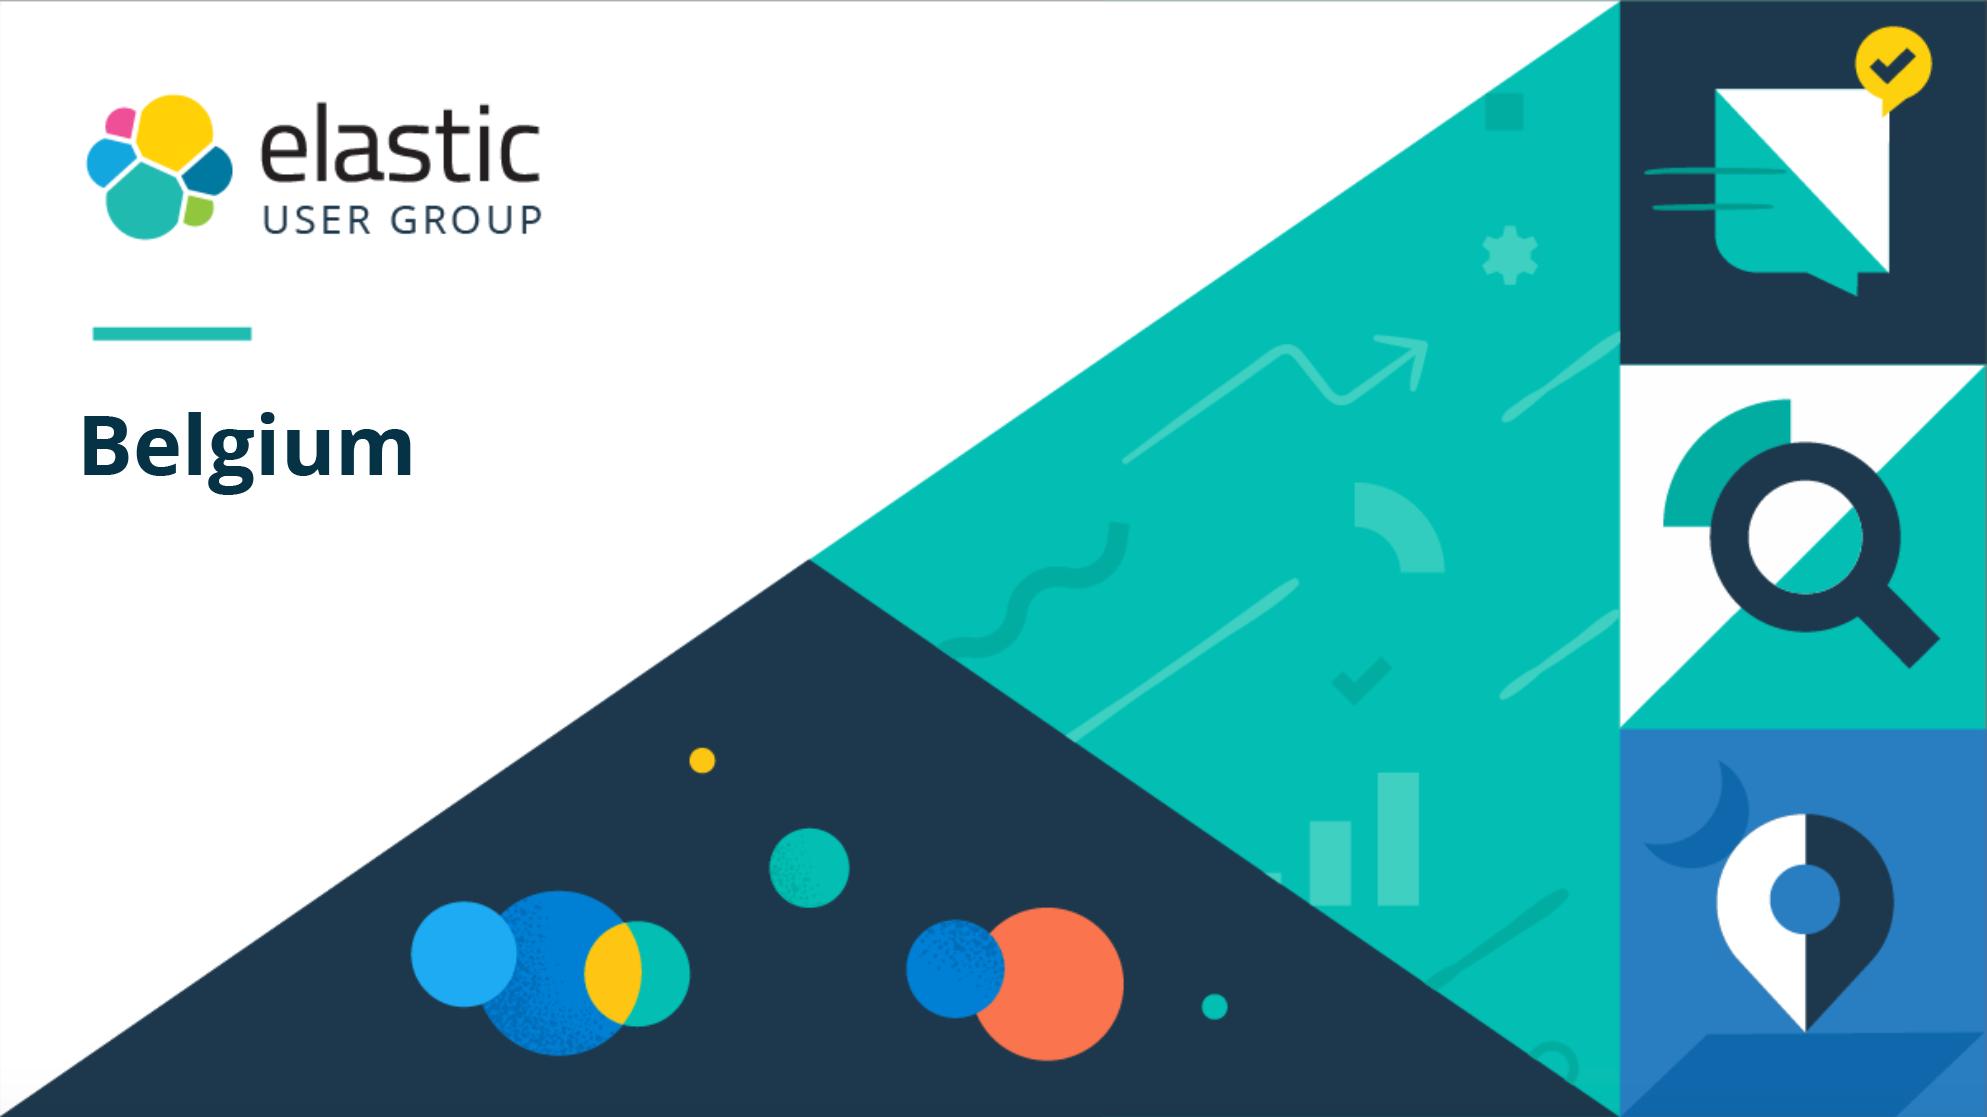 Elastic Belgium User Group